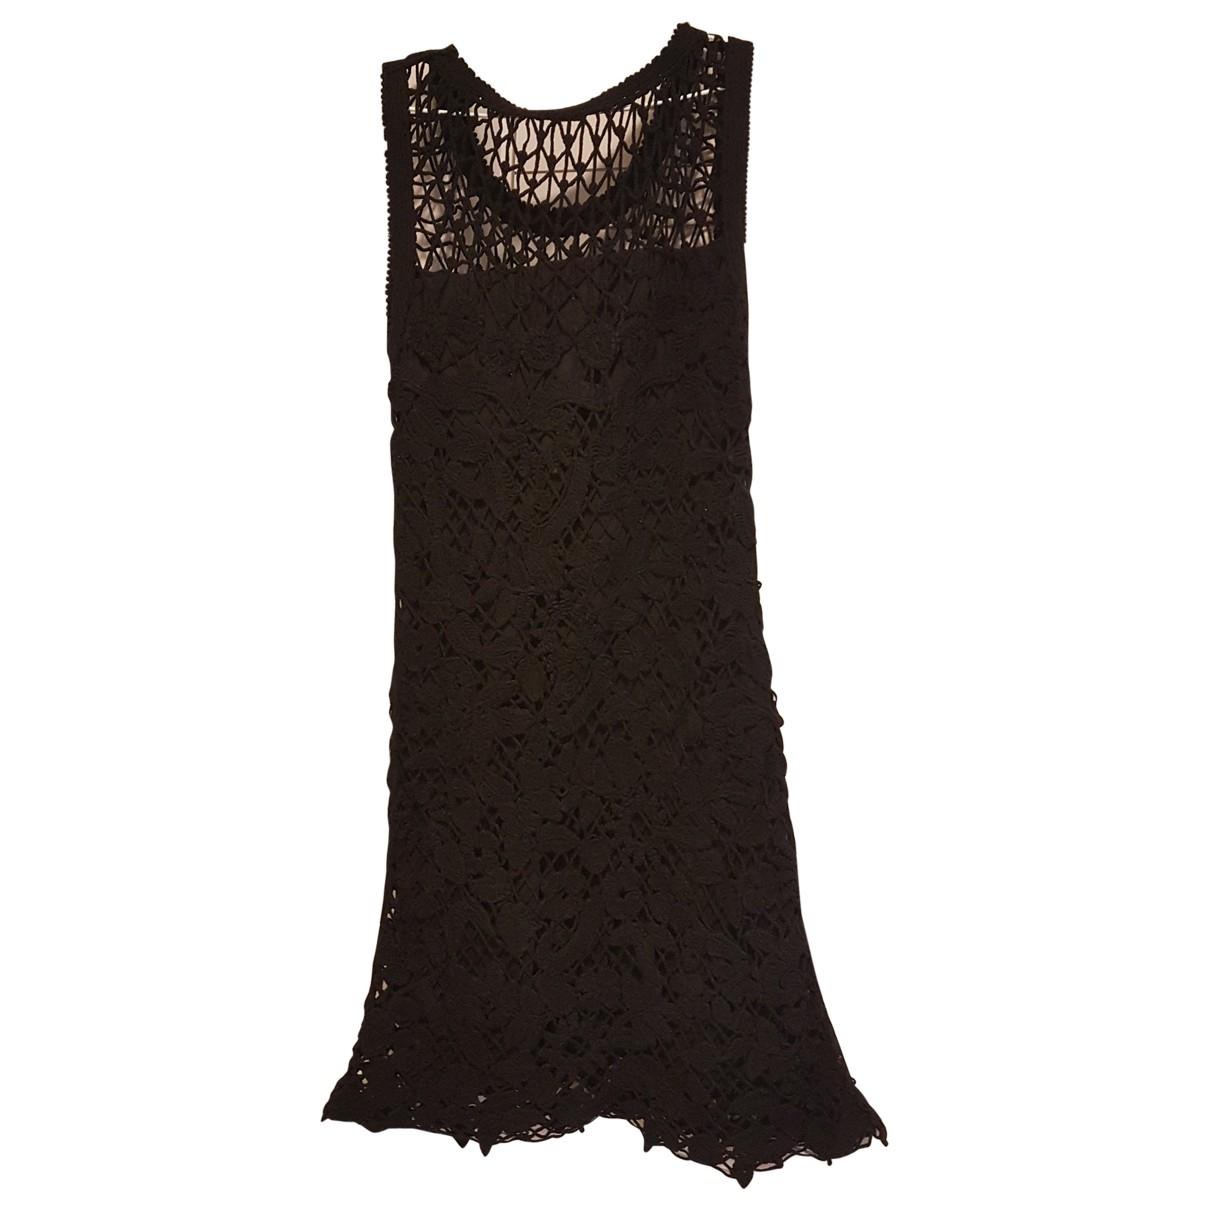 Bimba Y Lola \N Black Cotton dress for Women M International